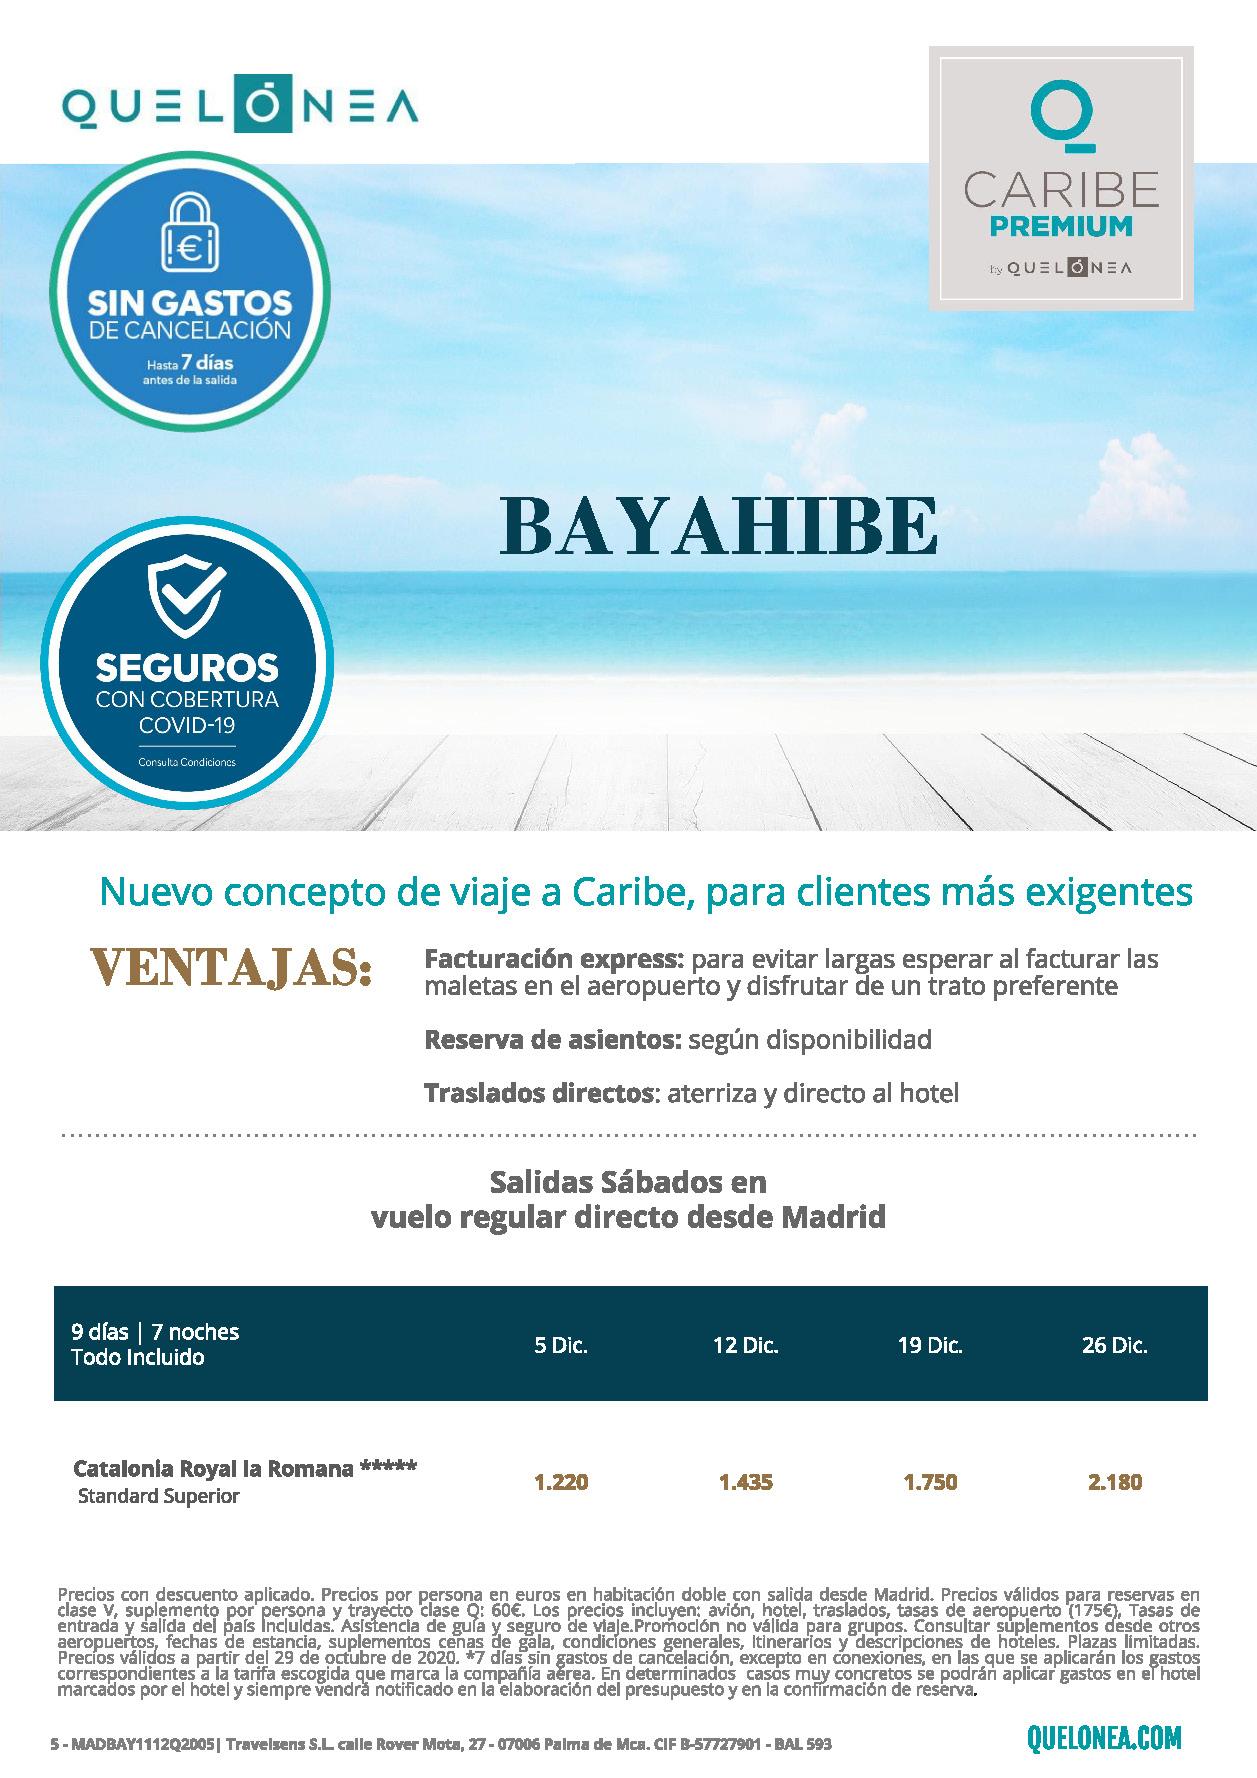 Ofertas Quelonea Caribe Premium Republica Dominicana Bayahibe Diciembre 2020 vuelo directo desde Madrid